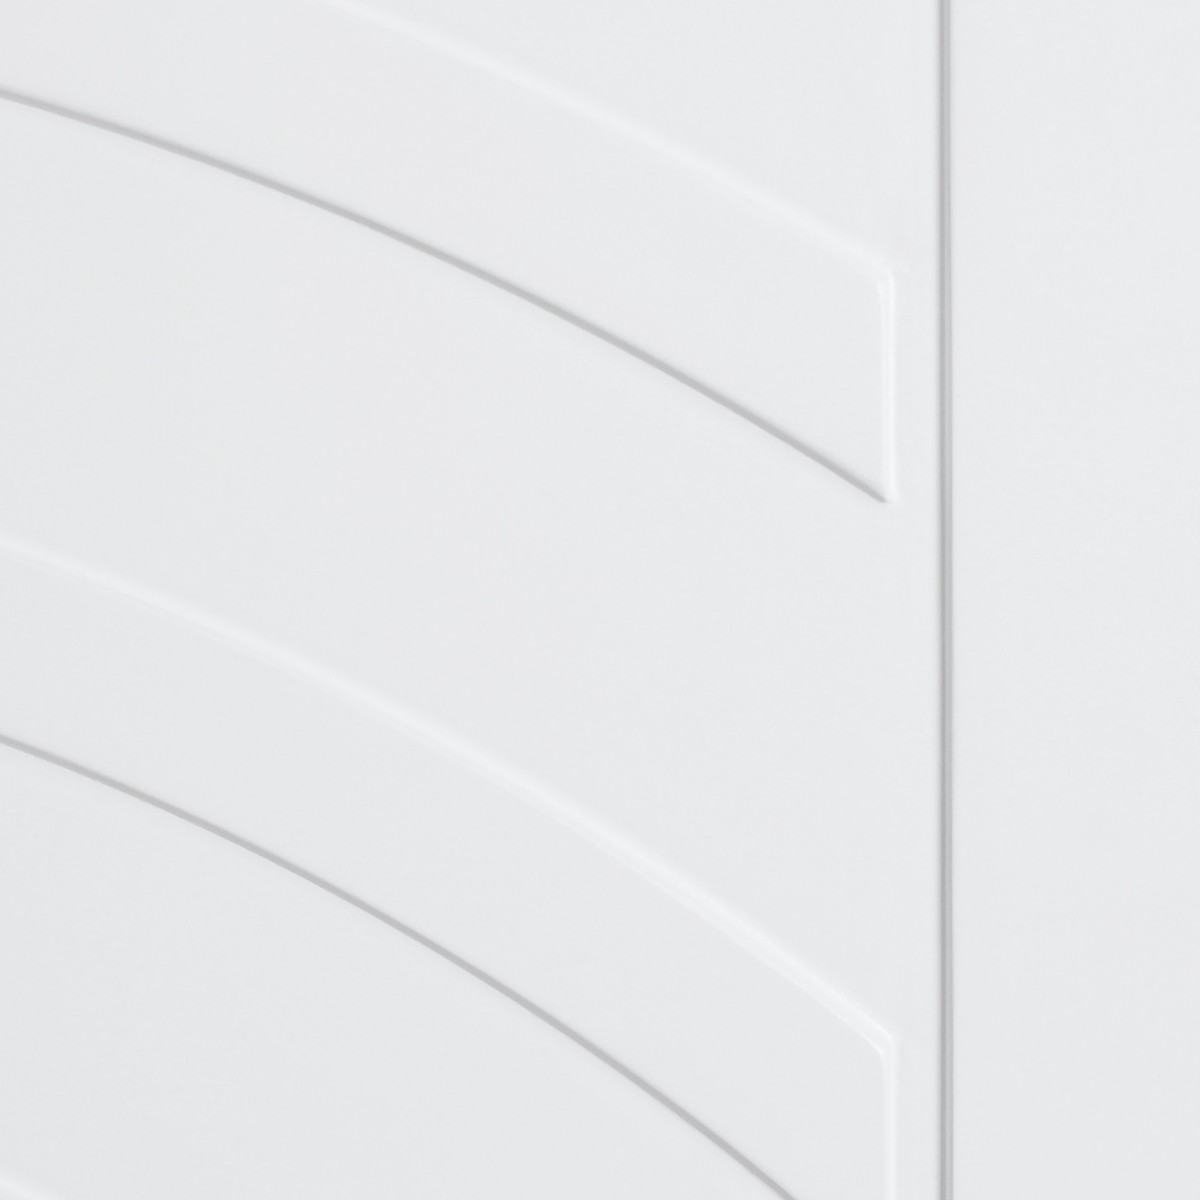 Дверь Межкомнатная Глухая Галактика 90x200 Цвет Белый